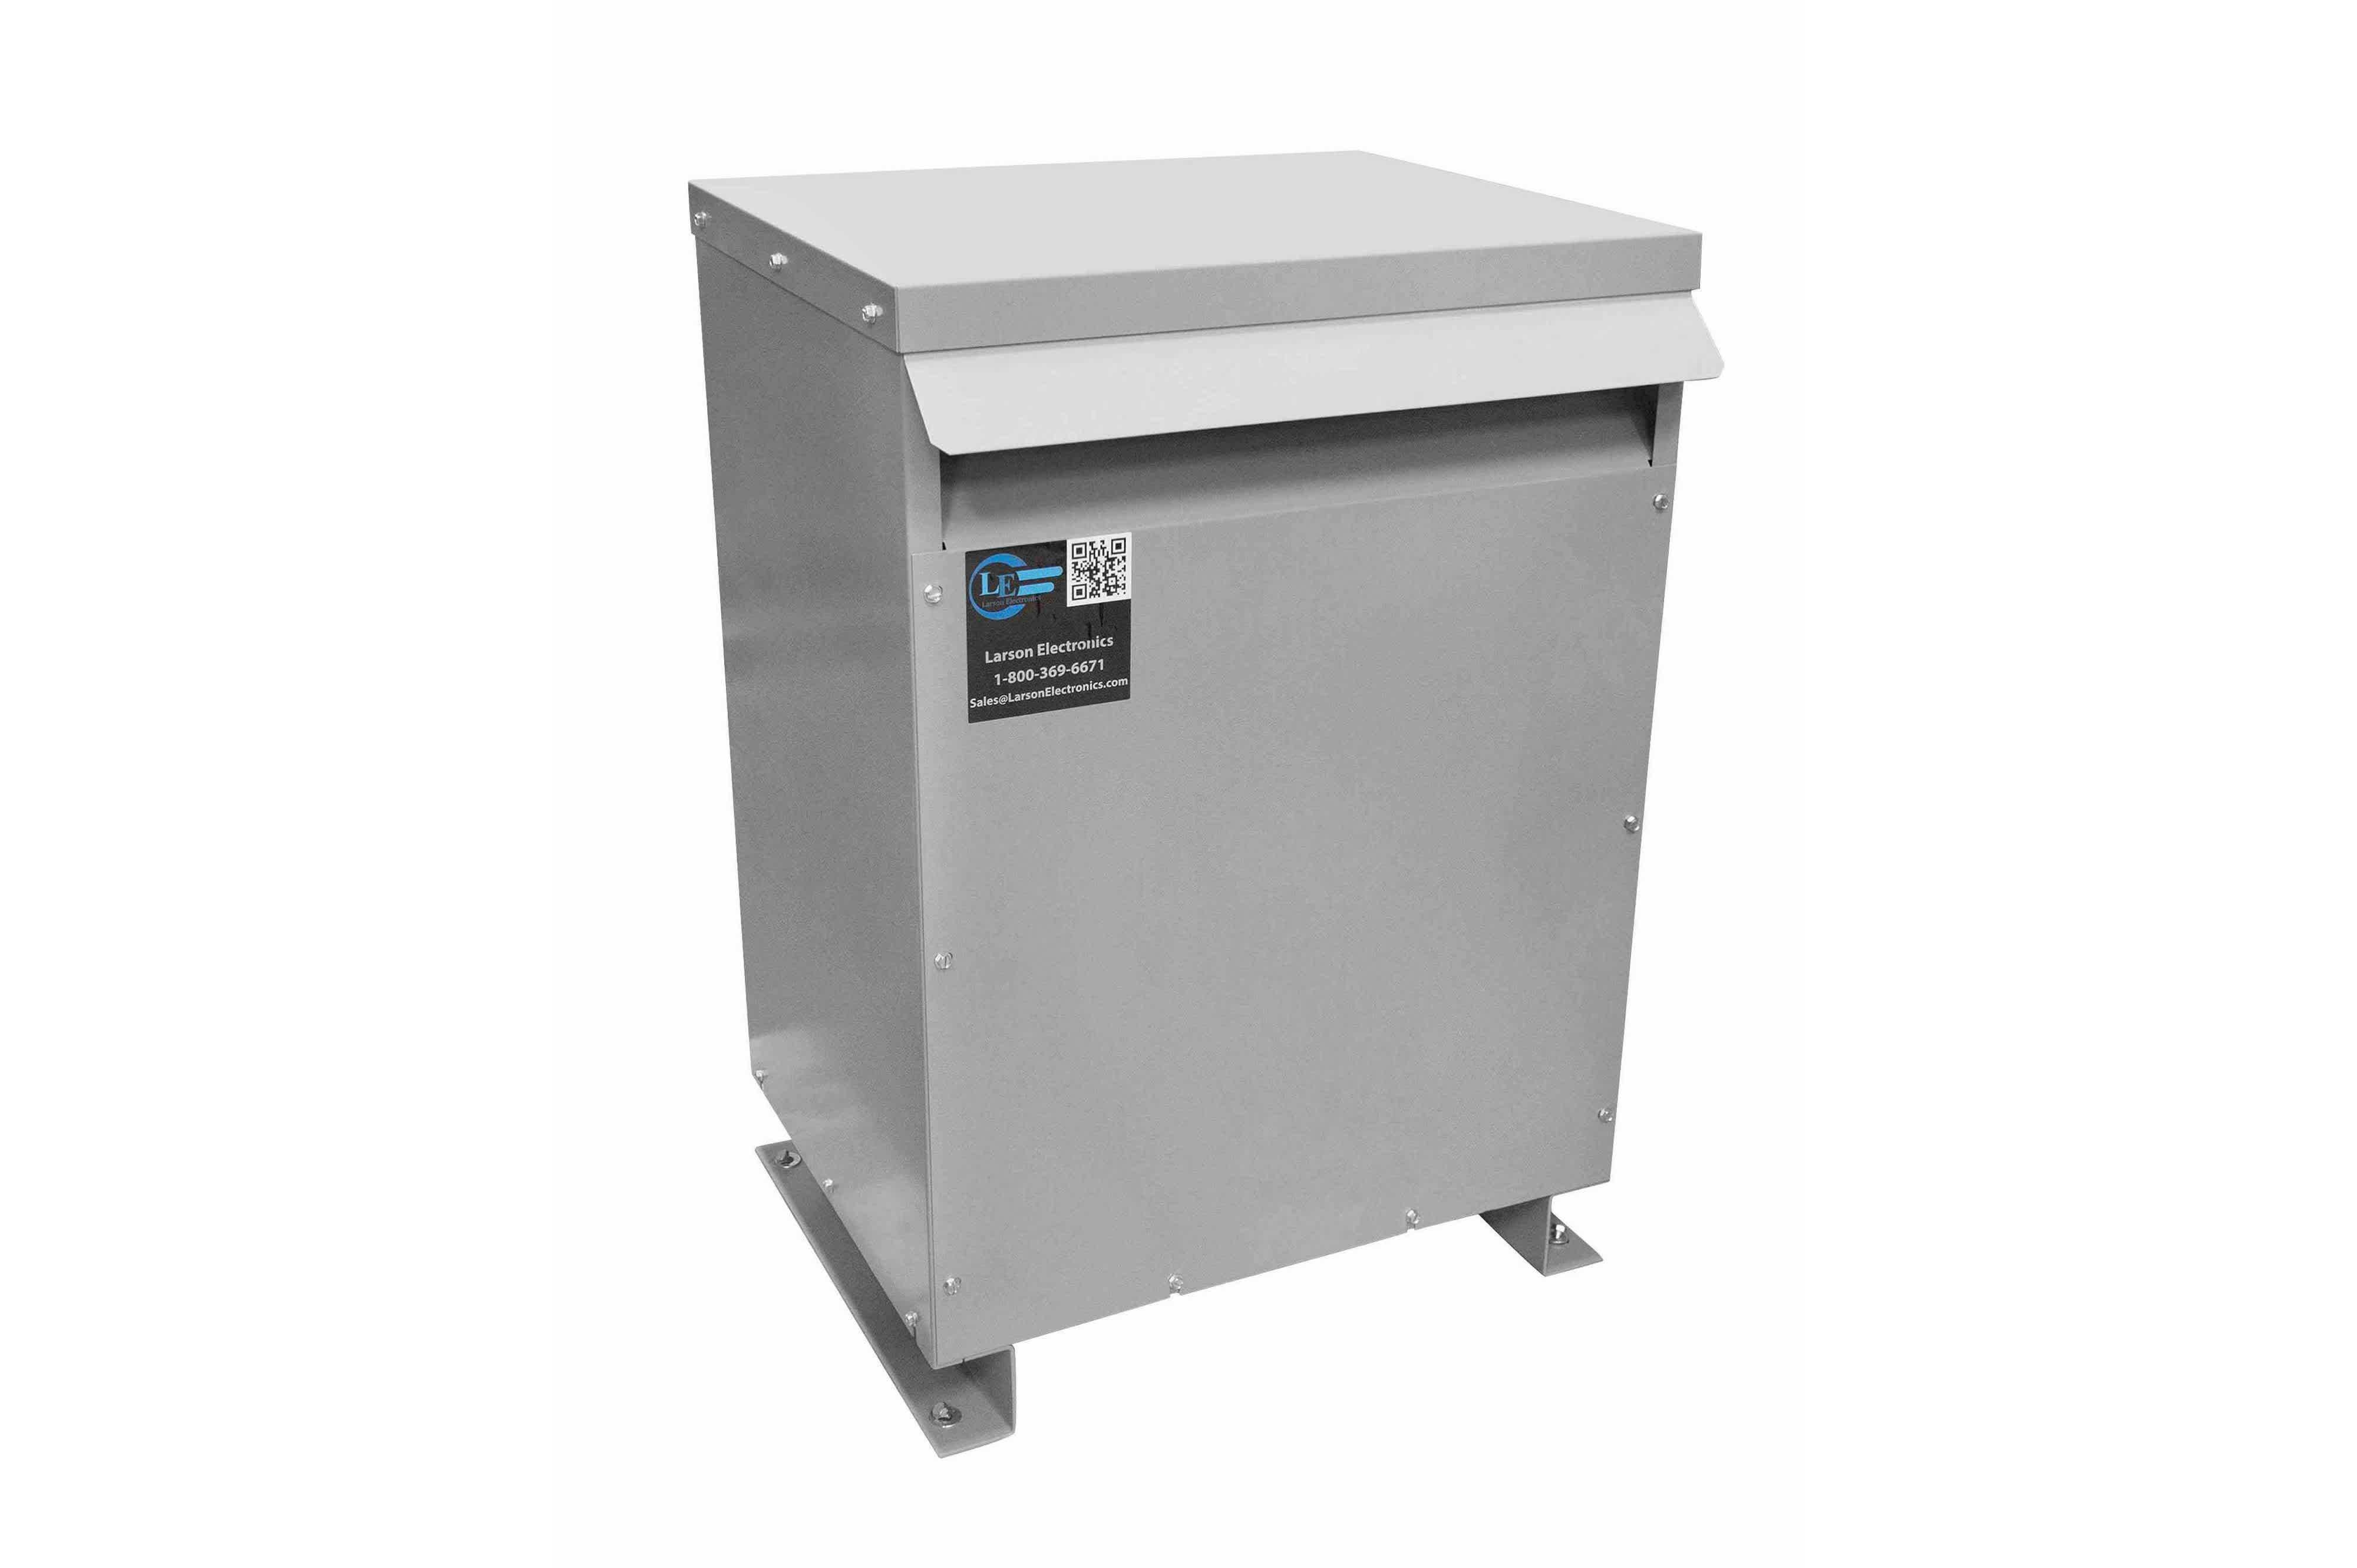 700 kVA 3PH Isolation Transformer, 400V Wye Primary, 208Y/120 Wye-N Secondary, N3R, Ventilated, 60 Hz